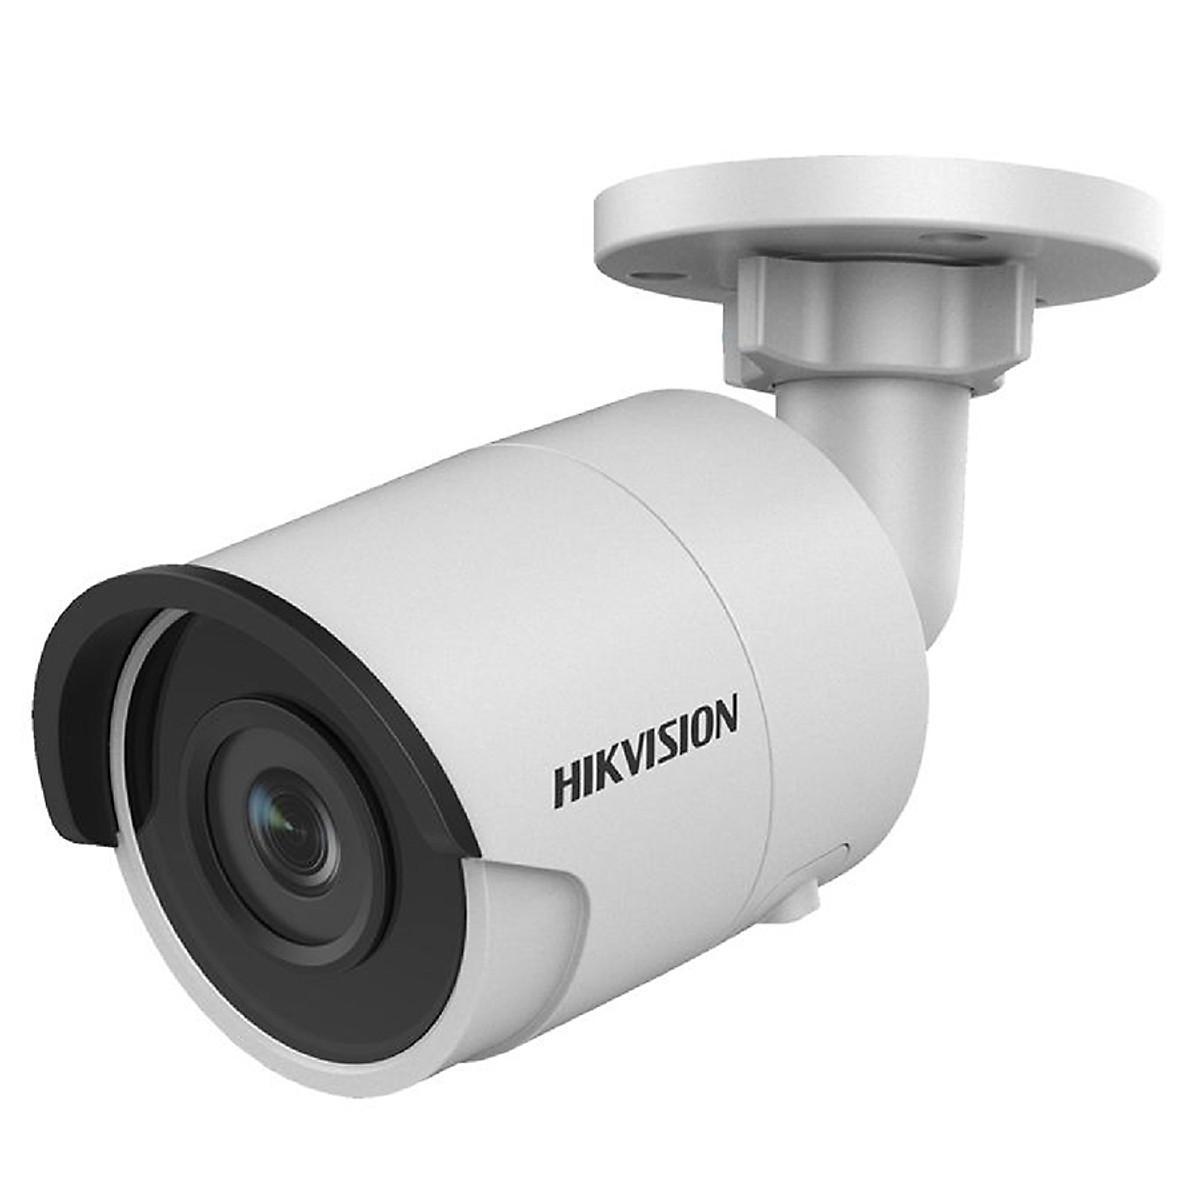 Camera IP Hồng Ngoại 3.0 Mega Pixel Hikvision DS-2CD2T35FWD-I8 – Hàng Nhập Khẩu